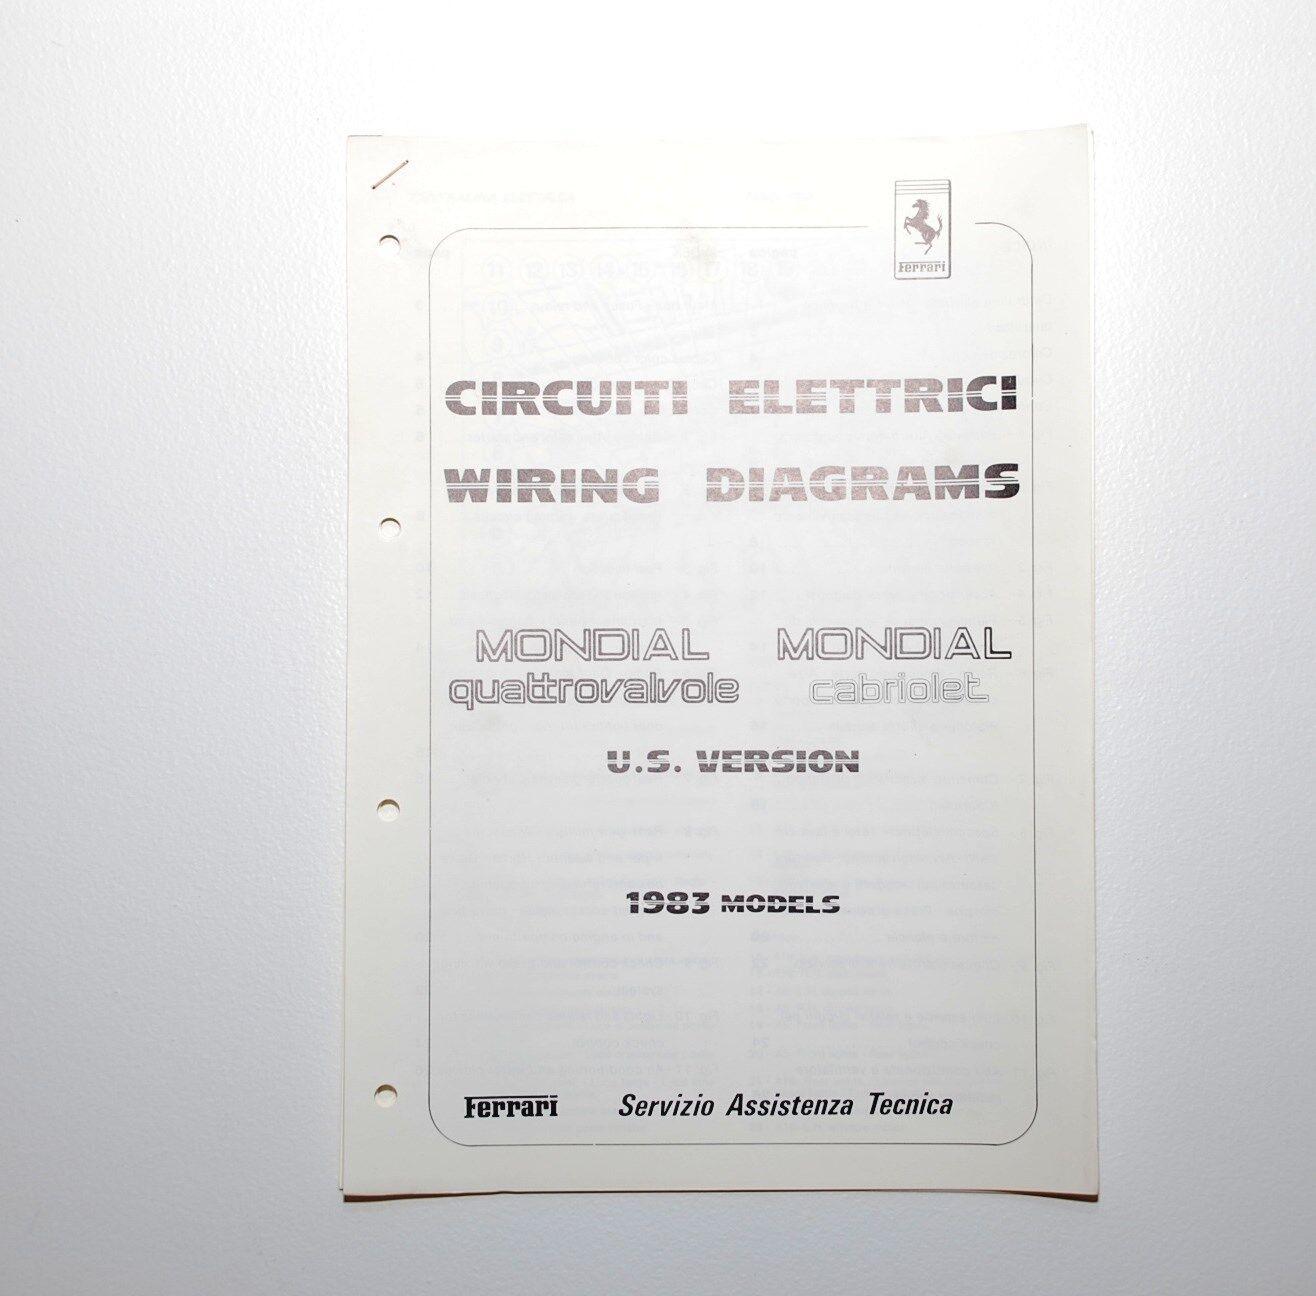 Ferrari 1983 Mondial Wiring Diagrams # 95990823 Algar Ferrari on Now ...